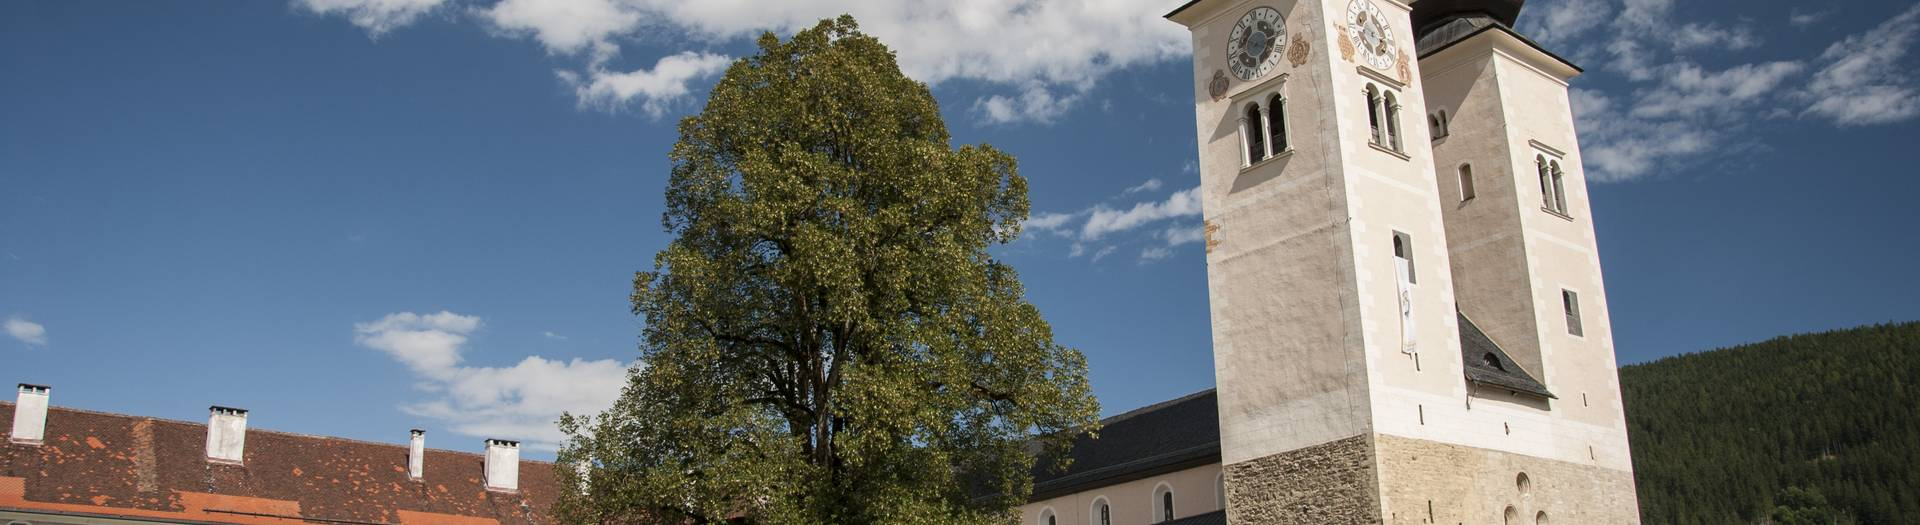 Dom in Gurk in Mittelkärnten